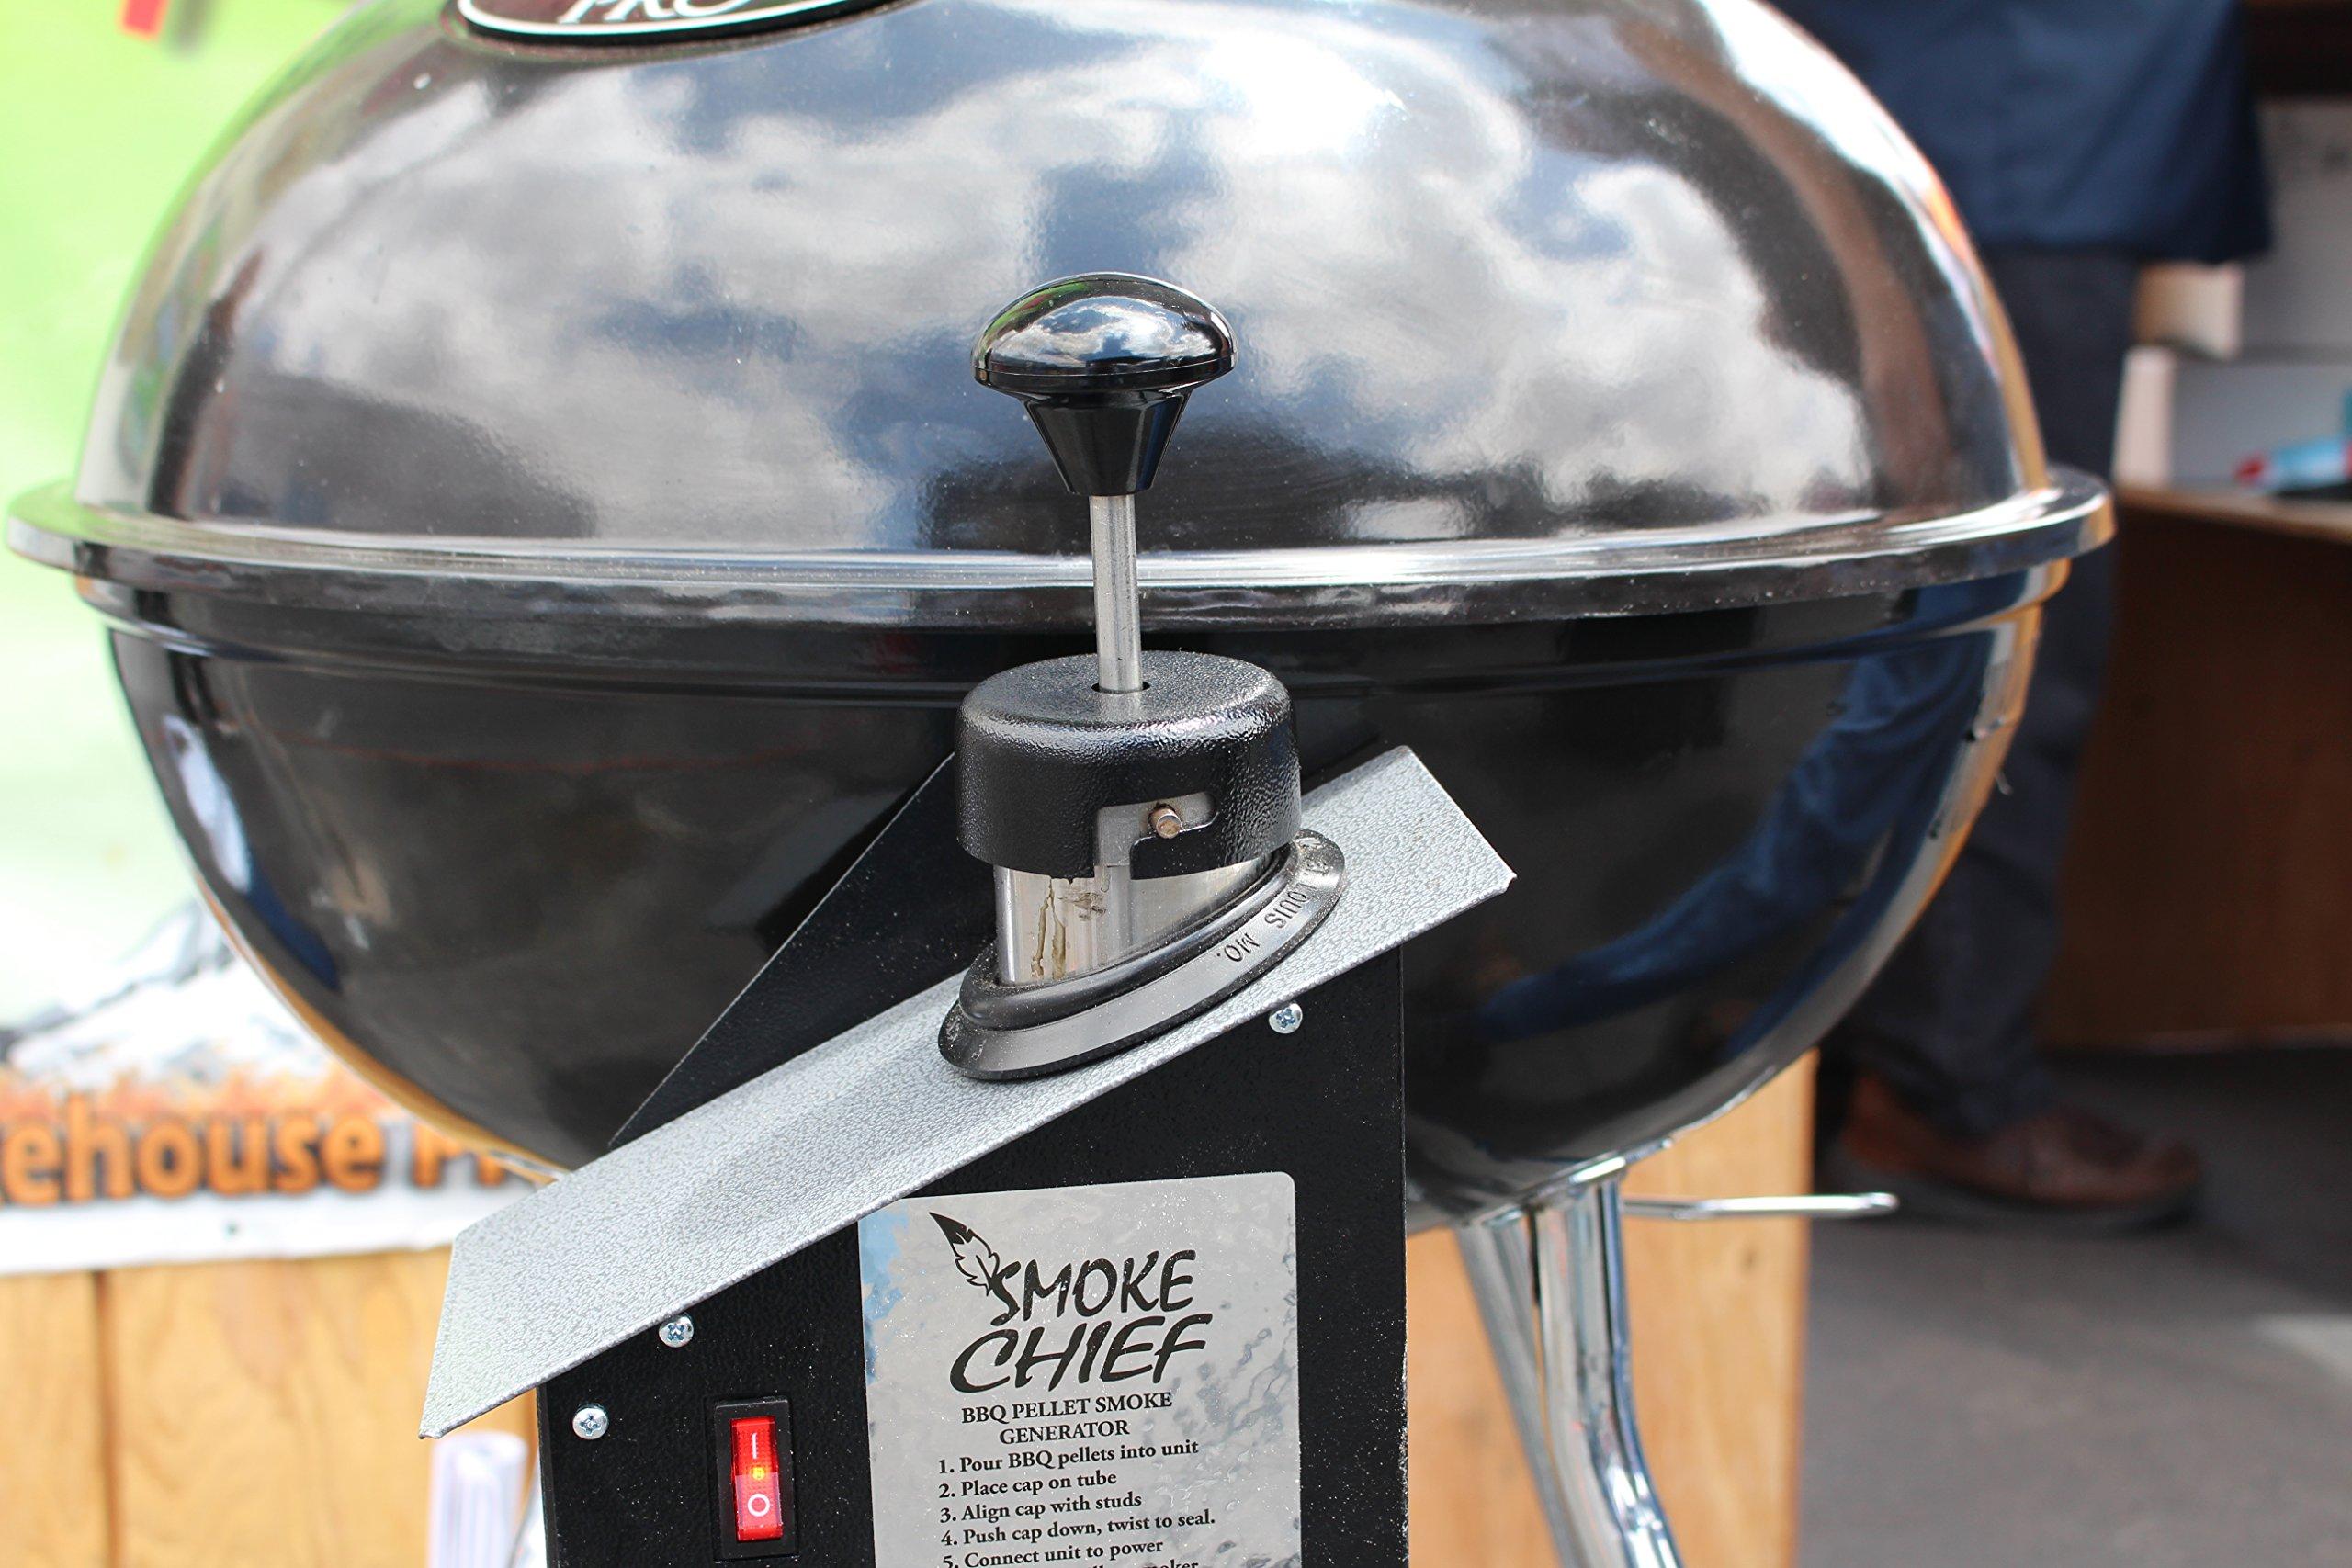 Smokehouse Products 9500-000-0000 Smoke Chief Cold Smoke Generator by SmokeHouse (Image #5)